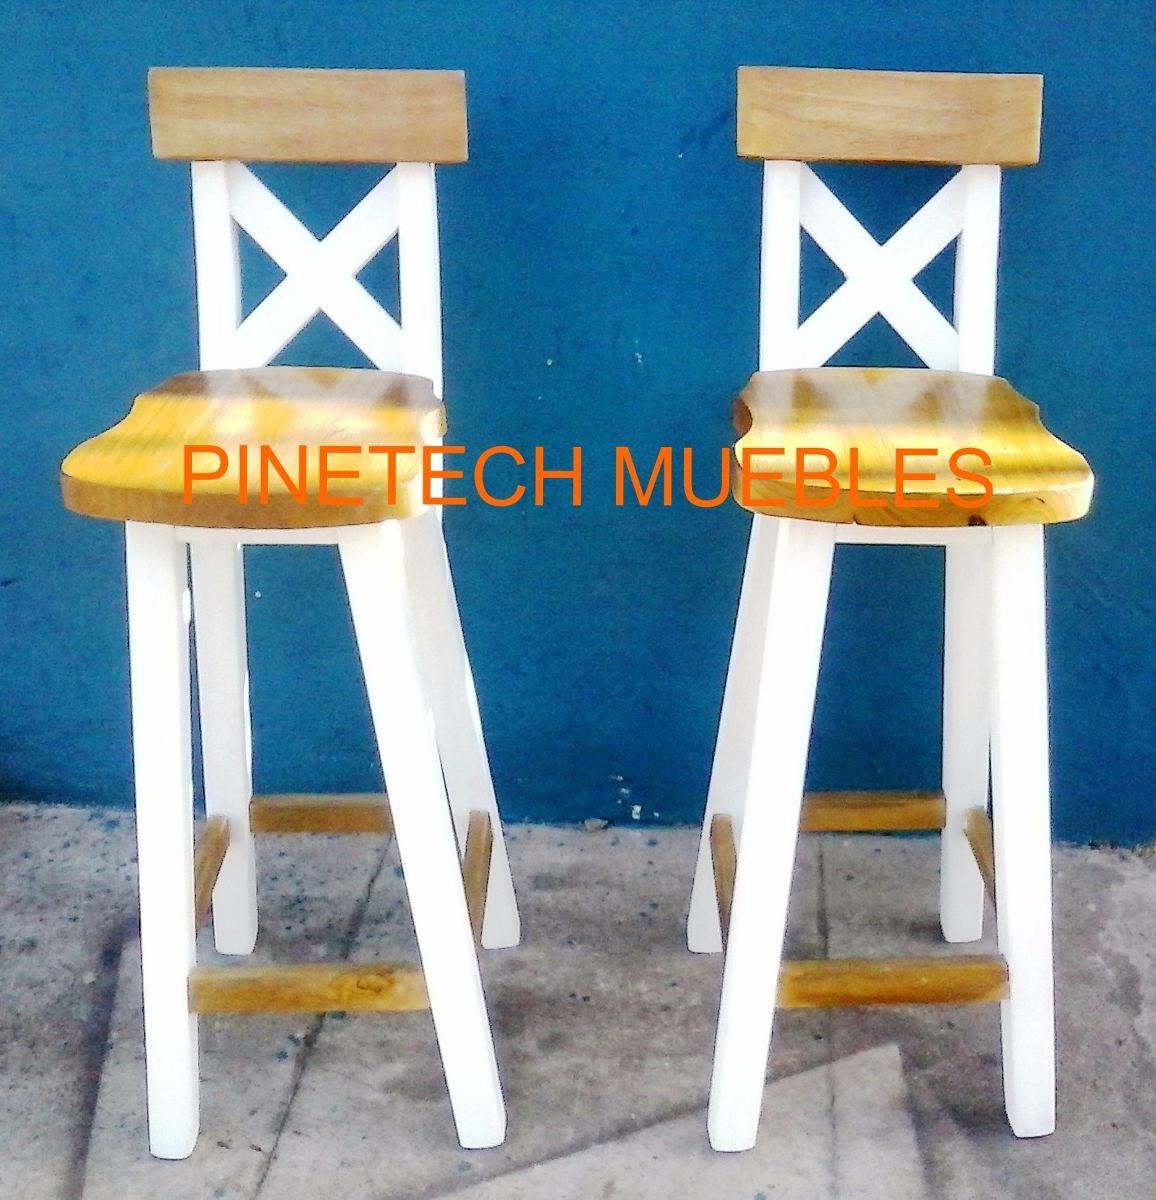 Sillas para barra de cocina mesas y sillas para restaurante bar cafeteria cocina madera sillas - Sillas altas de cocina ...